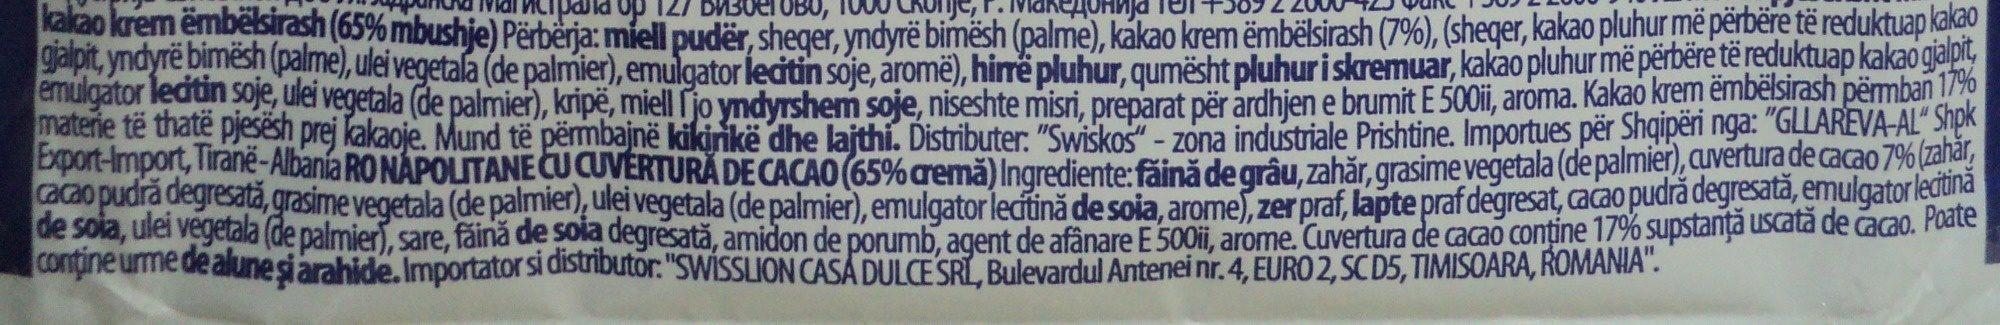 Linea Napolitana cu cuvertura de cacao - Ingredients - ro